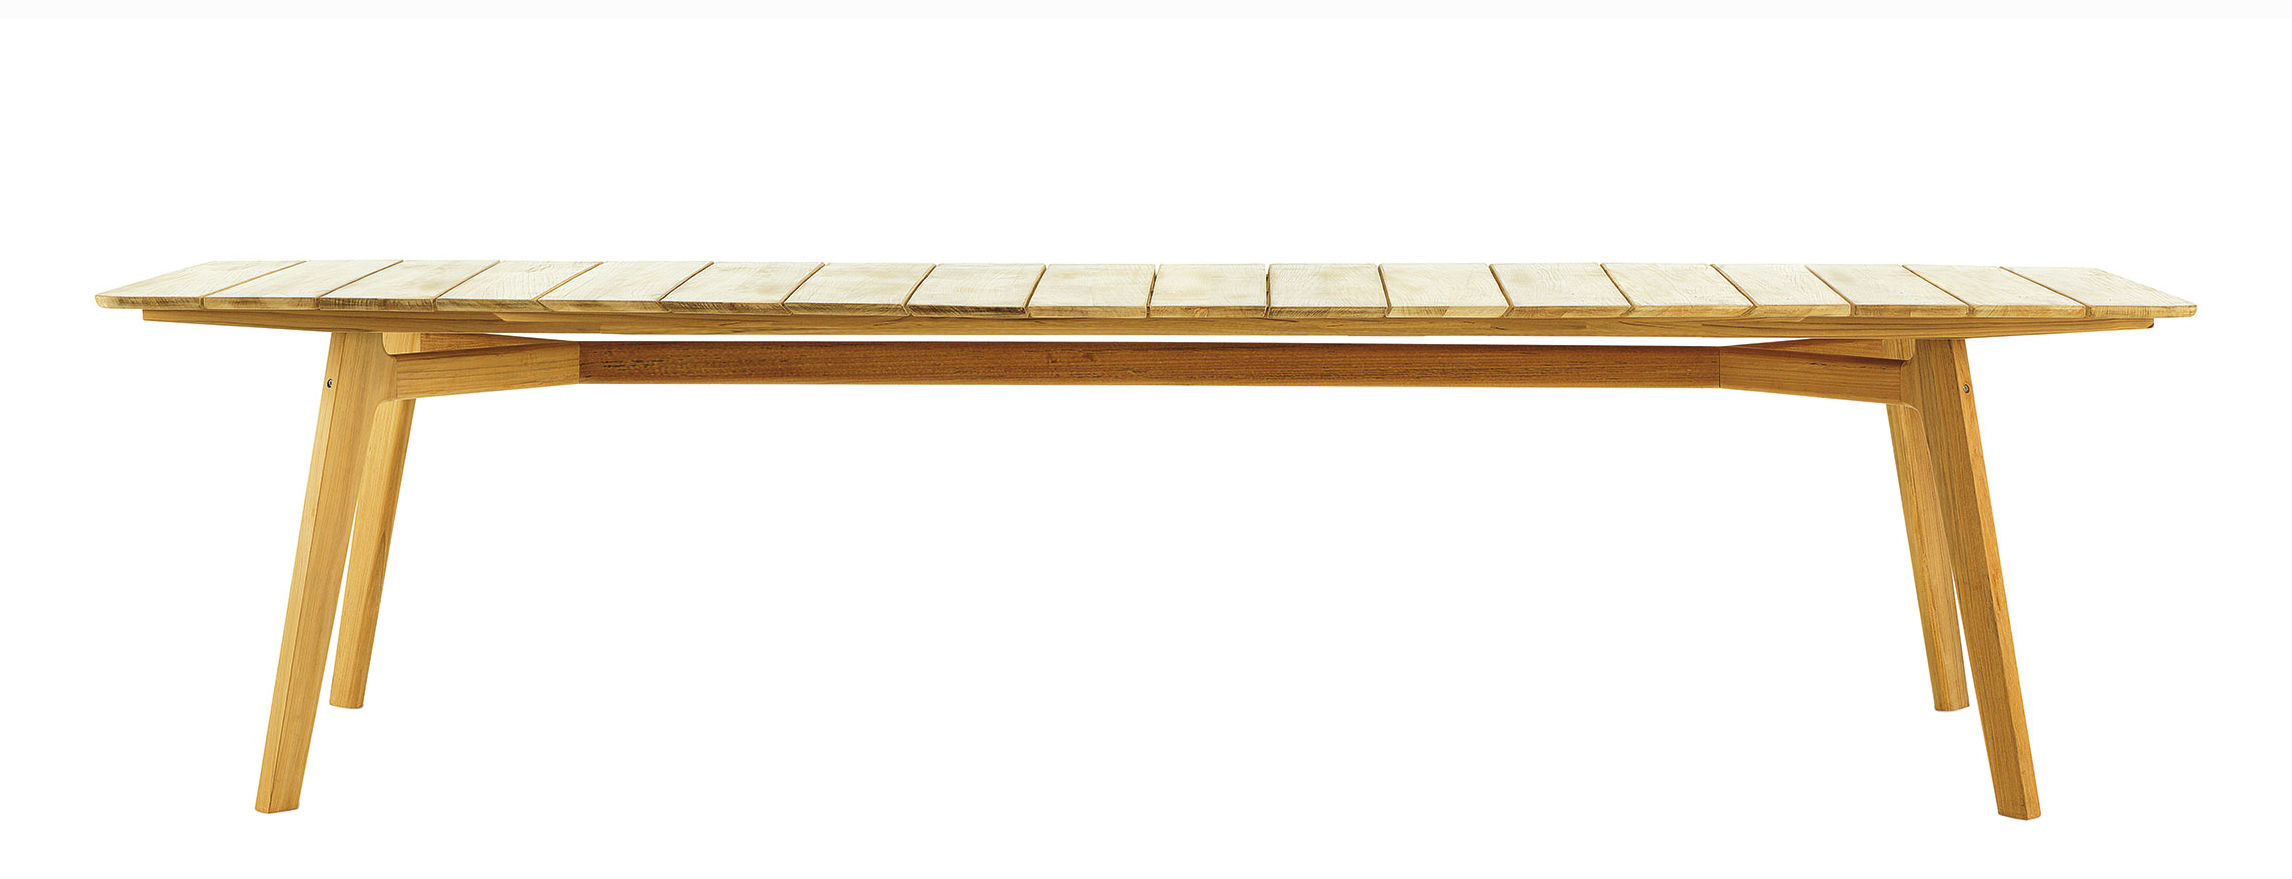 Outdoor - Tische - Knit rechteckiger Tisch / 263 x 110 cm - Teakholz - Ethimo - 263 x 110 cm / Teakholz - Teck massif naturel